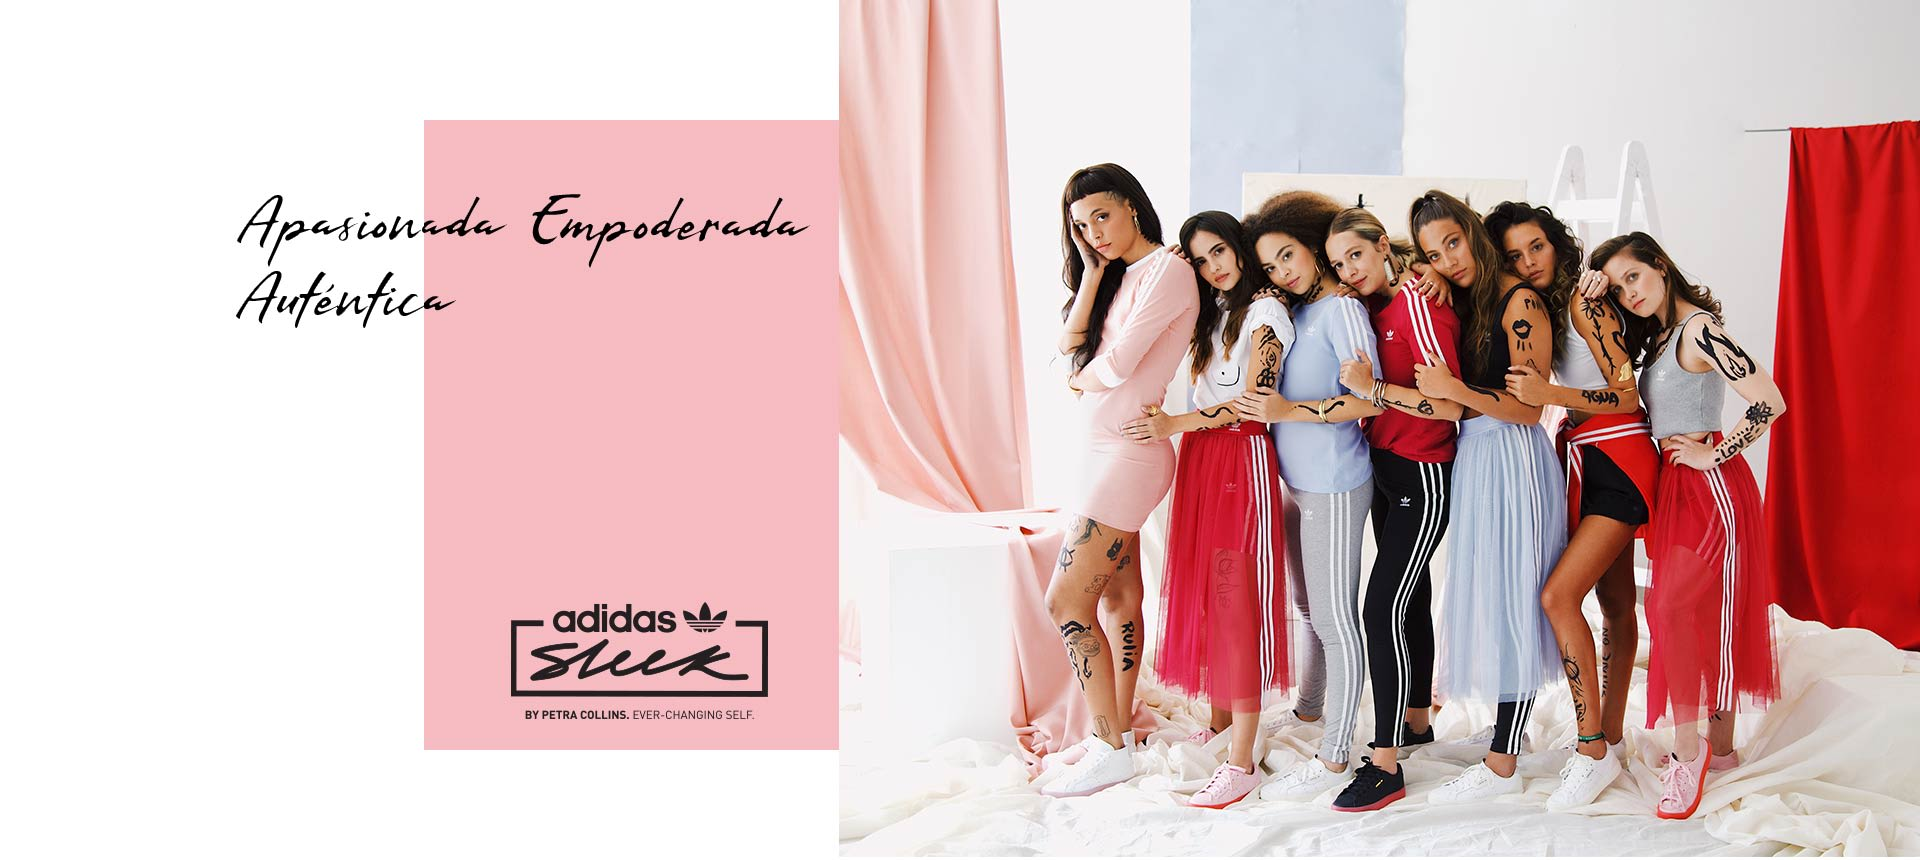 sale retailer 3825d 6aa24 Sitio Oficial adidas   adidas Perú